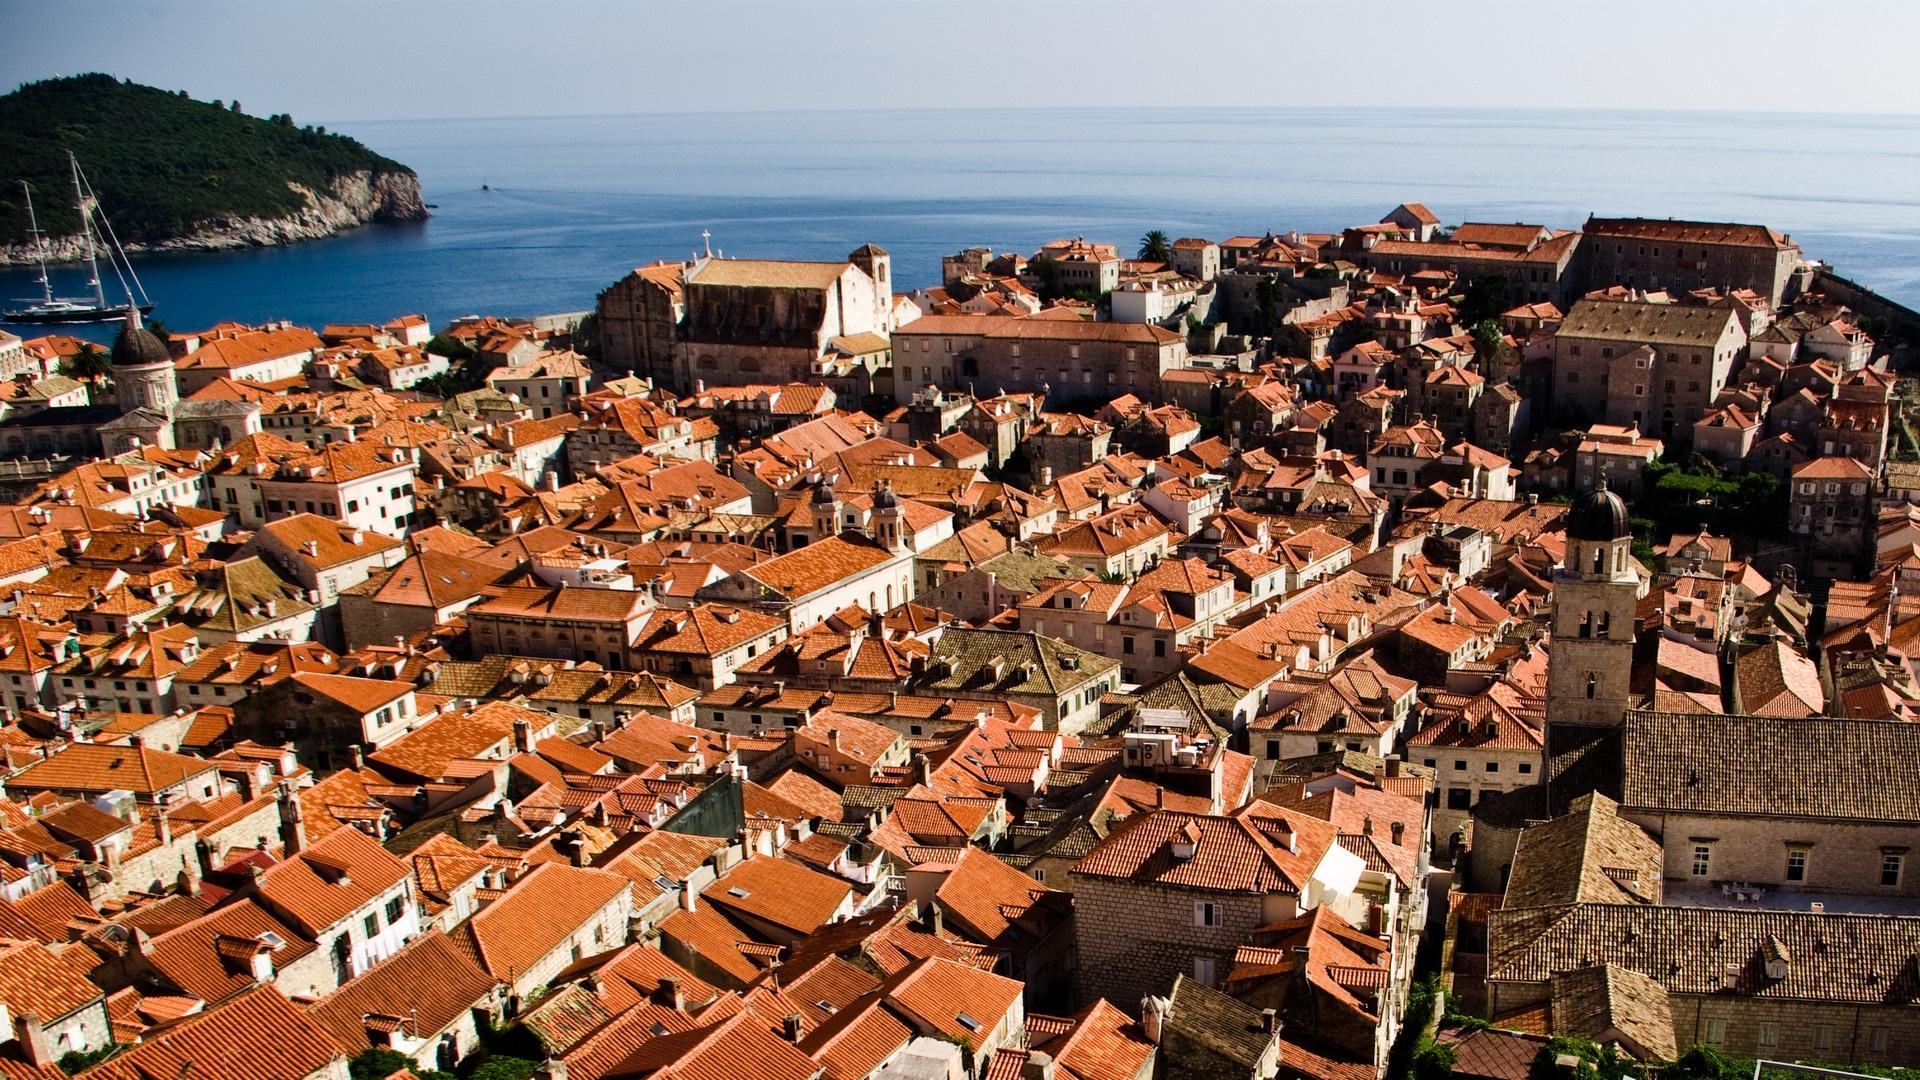 Обои Dubrovnik, здания, остров, дома, croatia, хорватия, адриатическое море, adriatic sea. Города foto 11